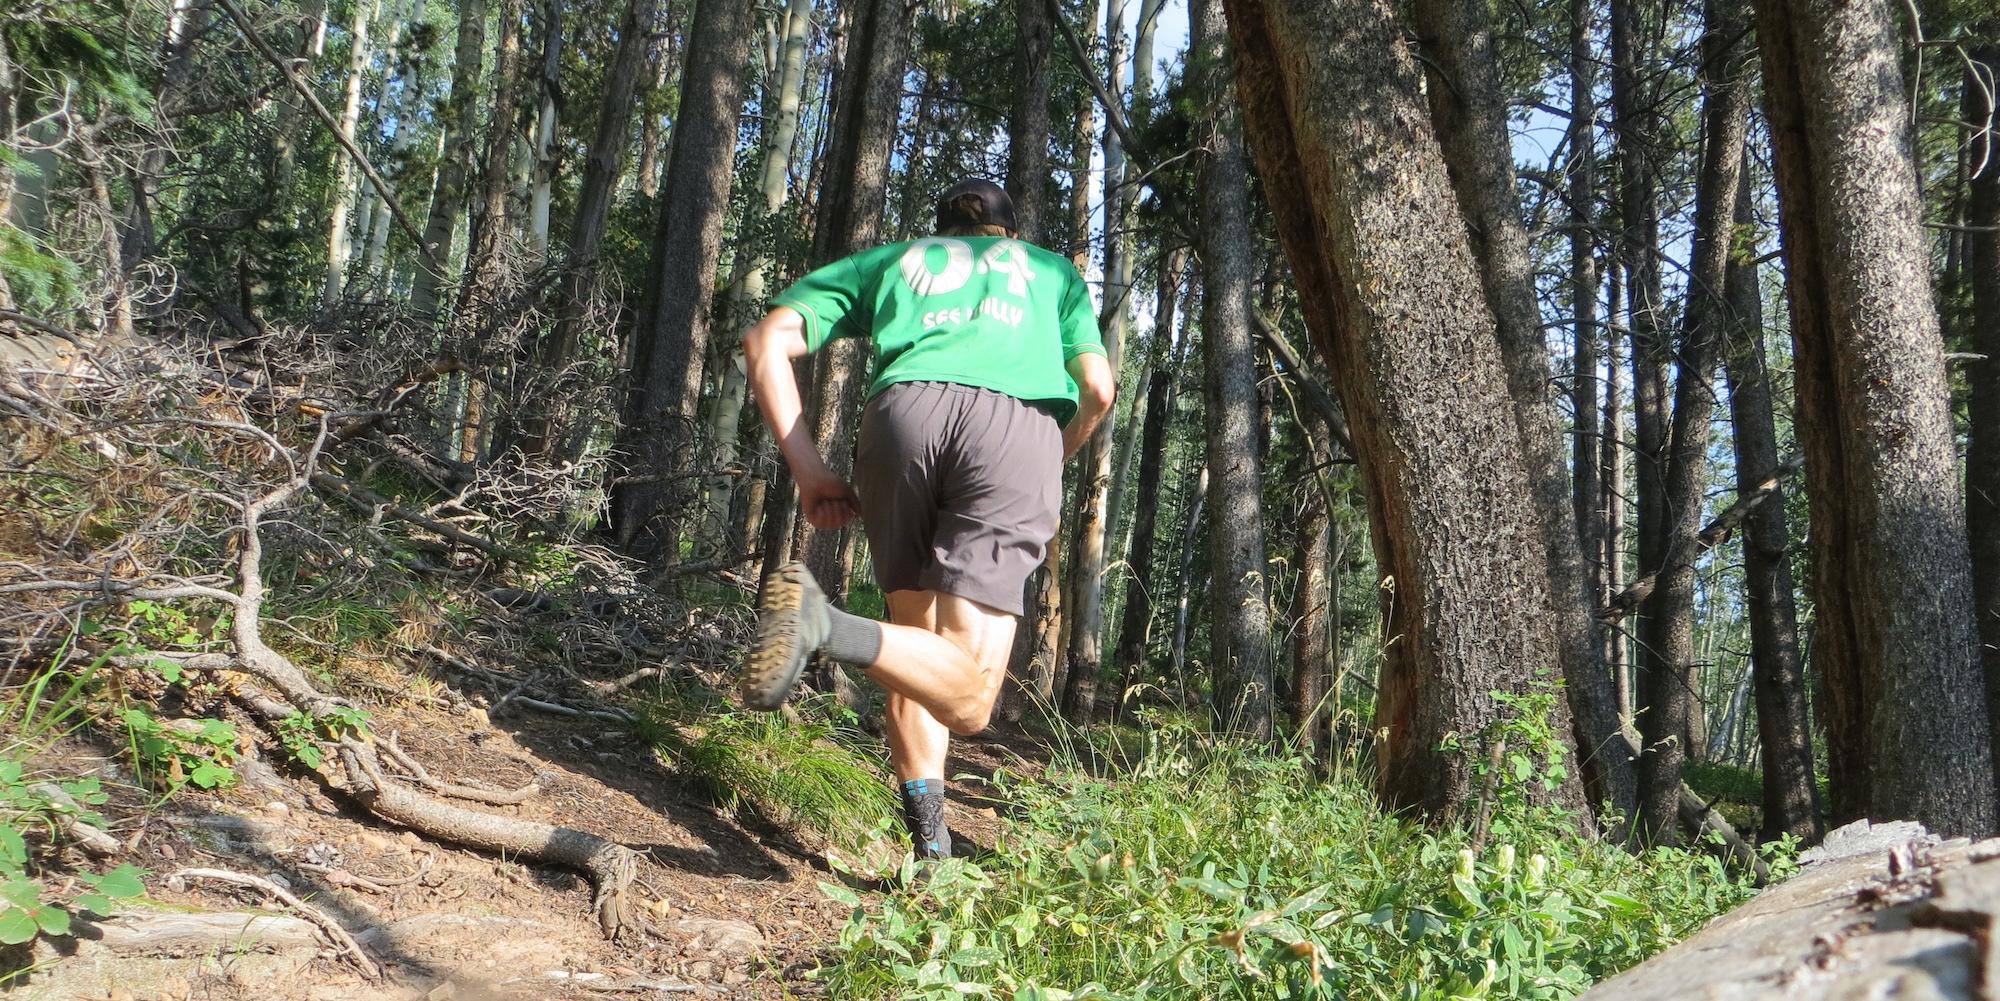 Cosmo Langsfeld reviews the Xero Mesa Trail for Blister.